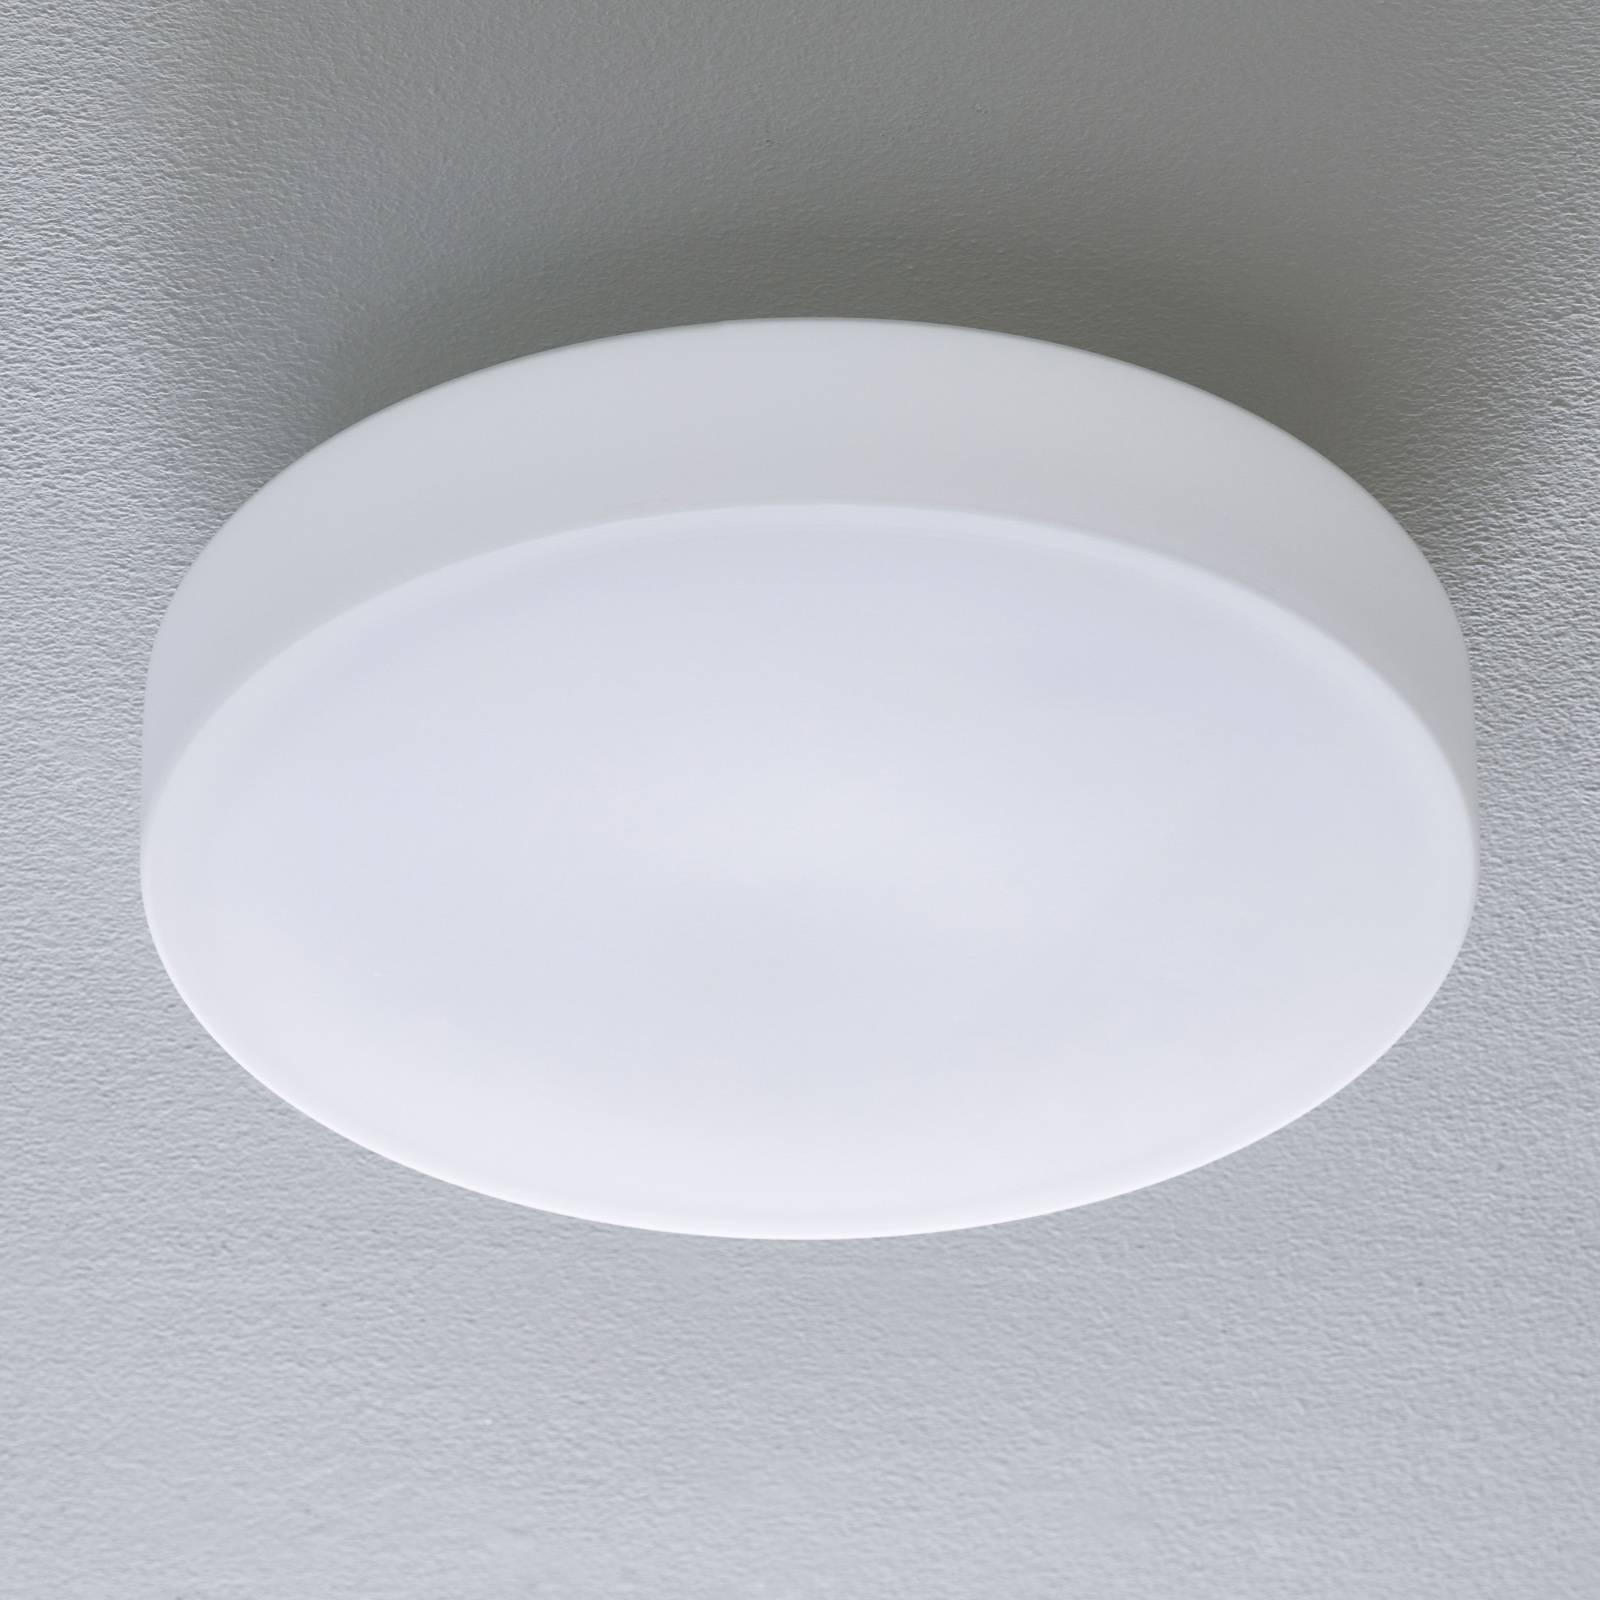 BEGA 50652 LED-kattovalo opaalilasi 4000K Ø39cm